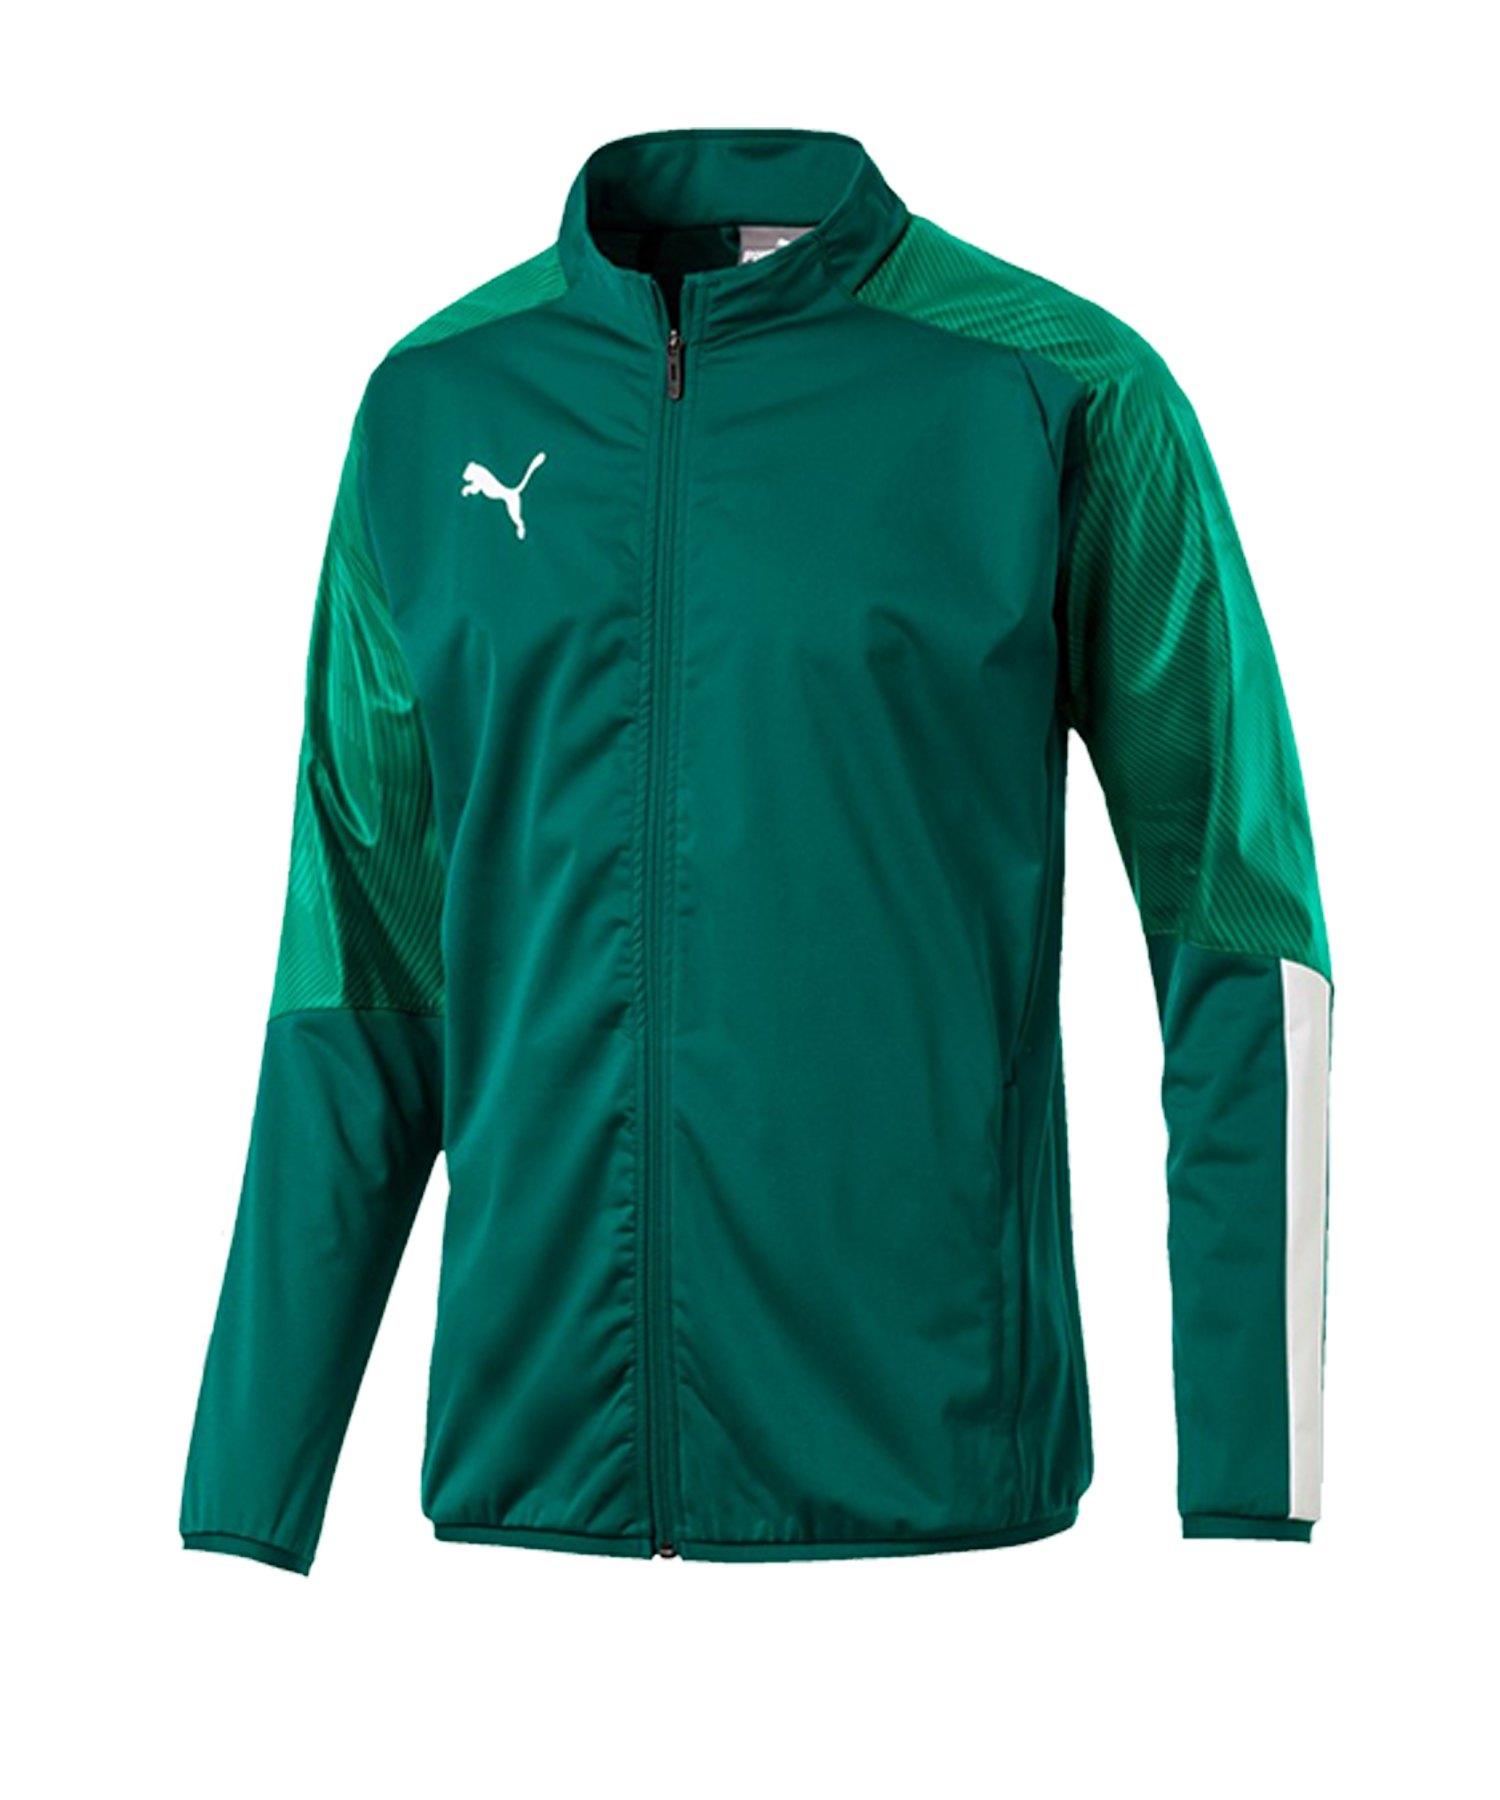 PUMA CUP Sideline Jacket Jacke Grün F05 - gruen